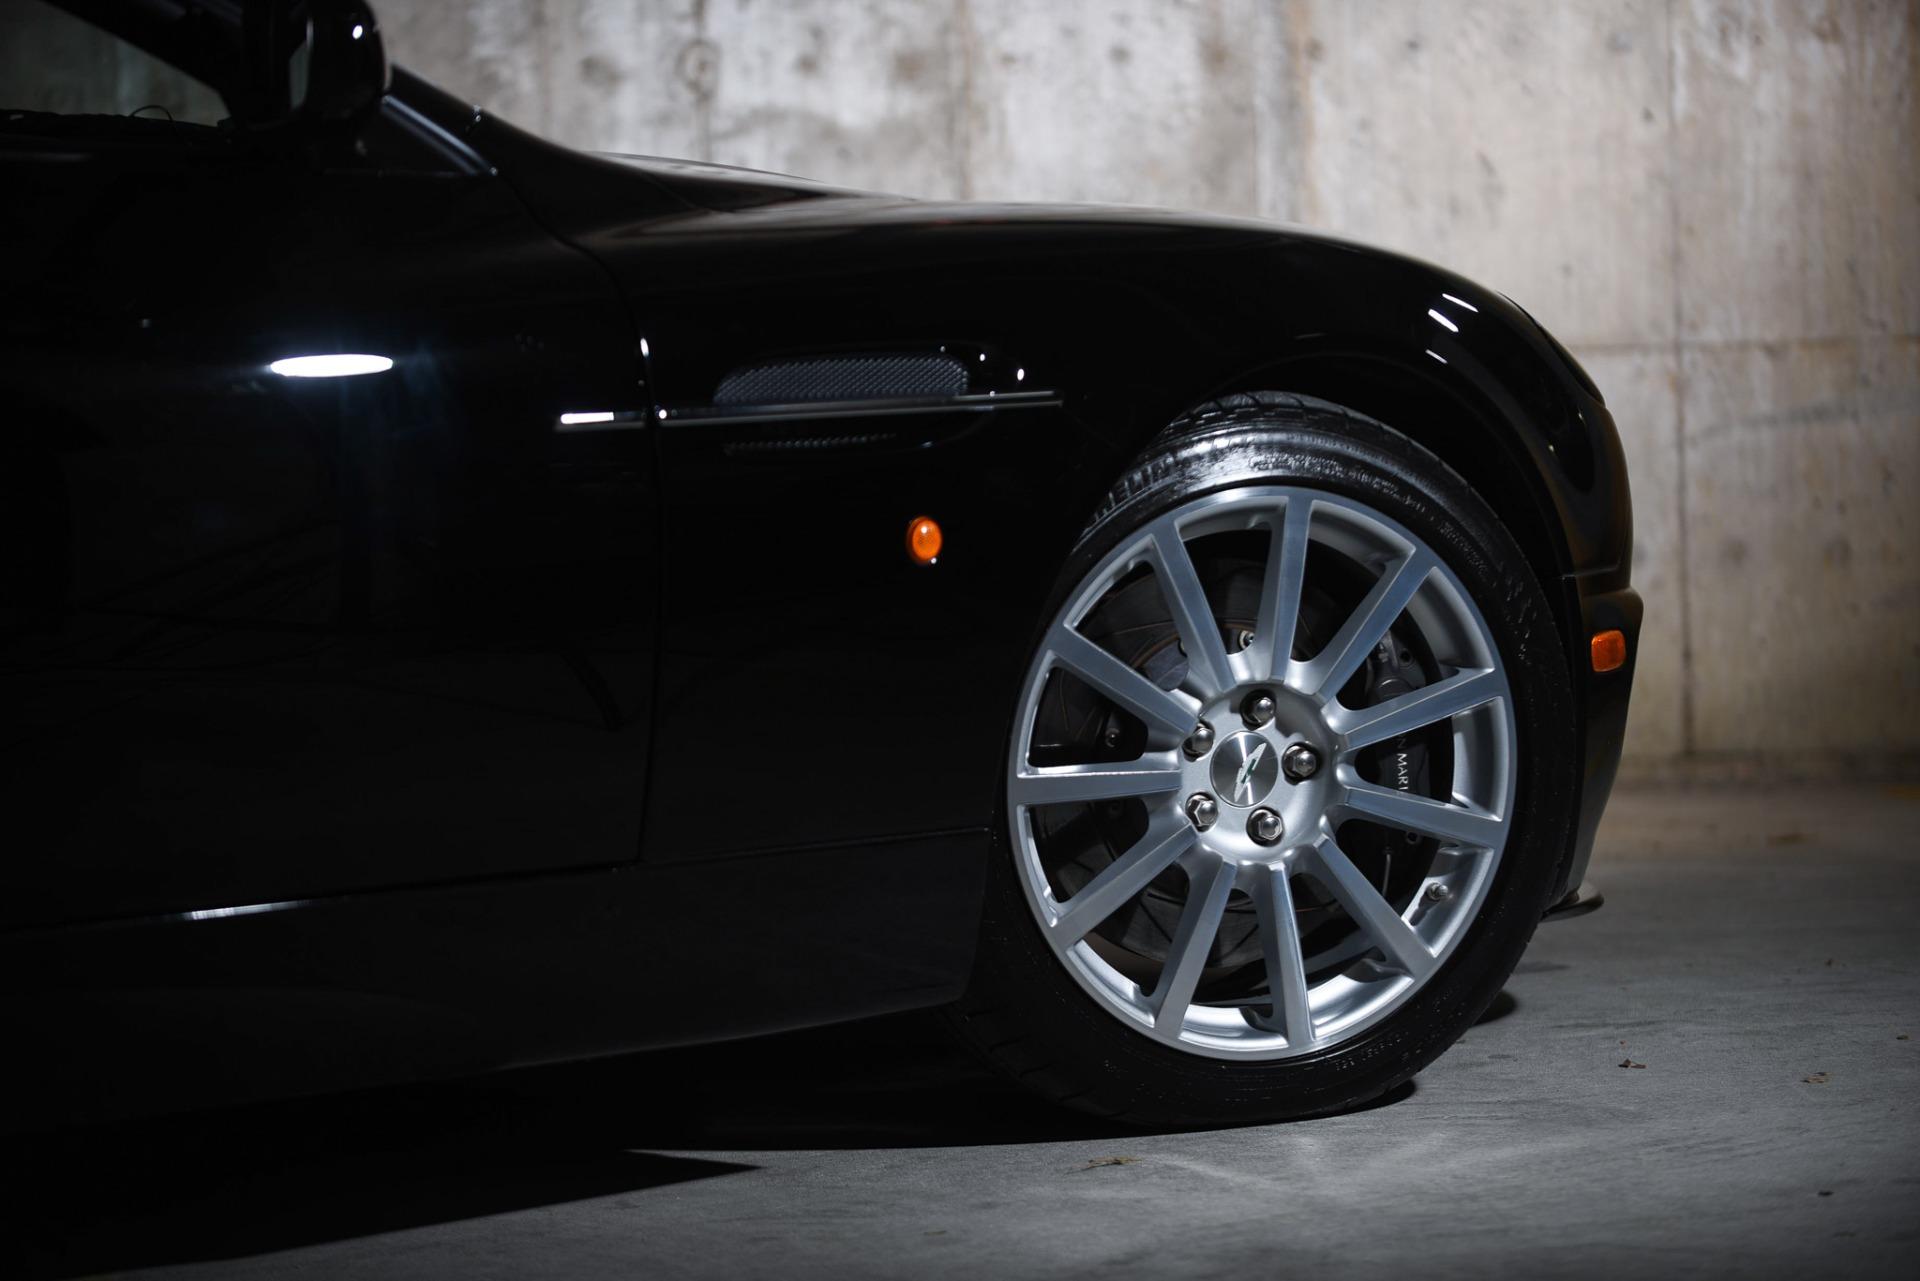 Used 2005 Aston Martin V12 Vanquish S | Valley Stream, NY